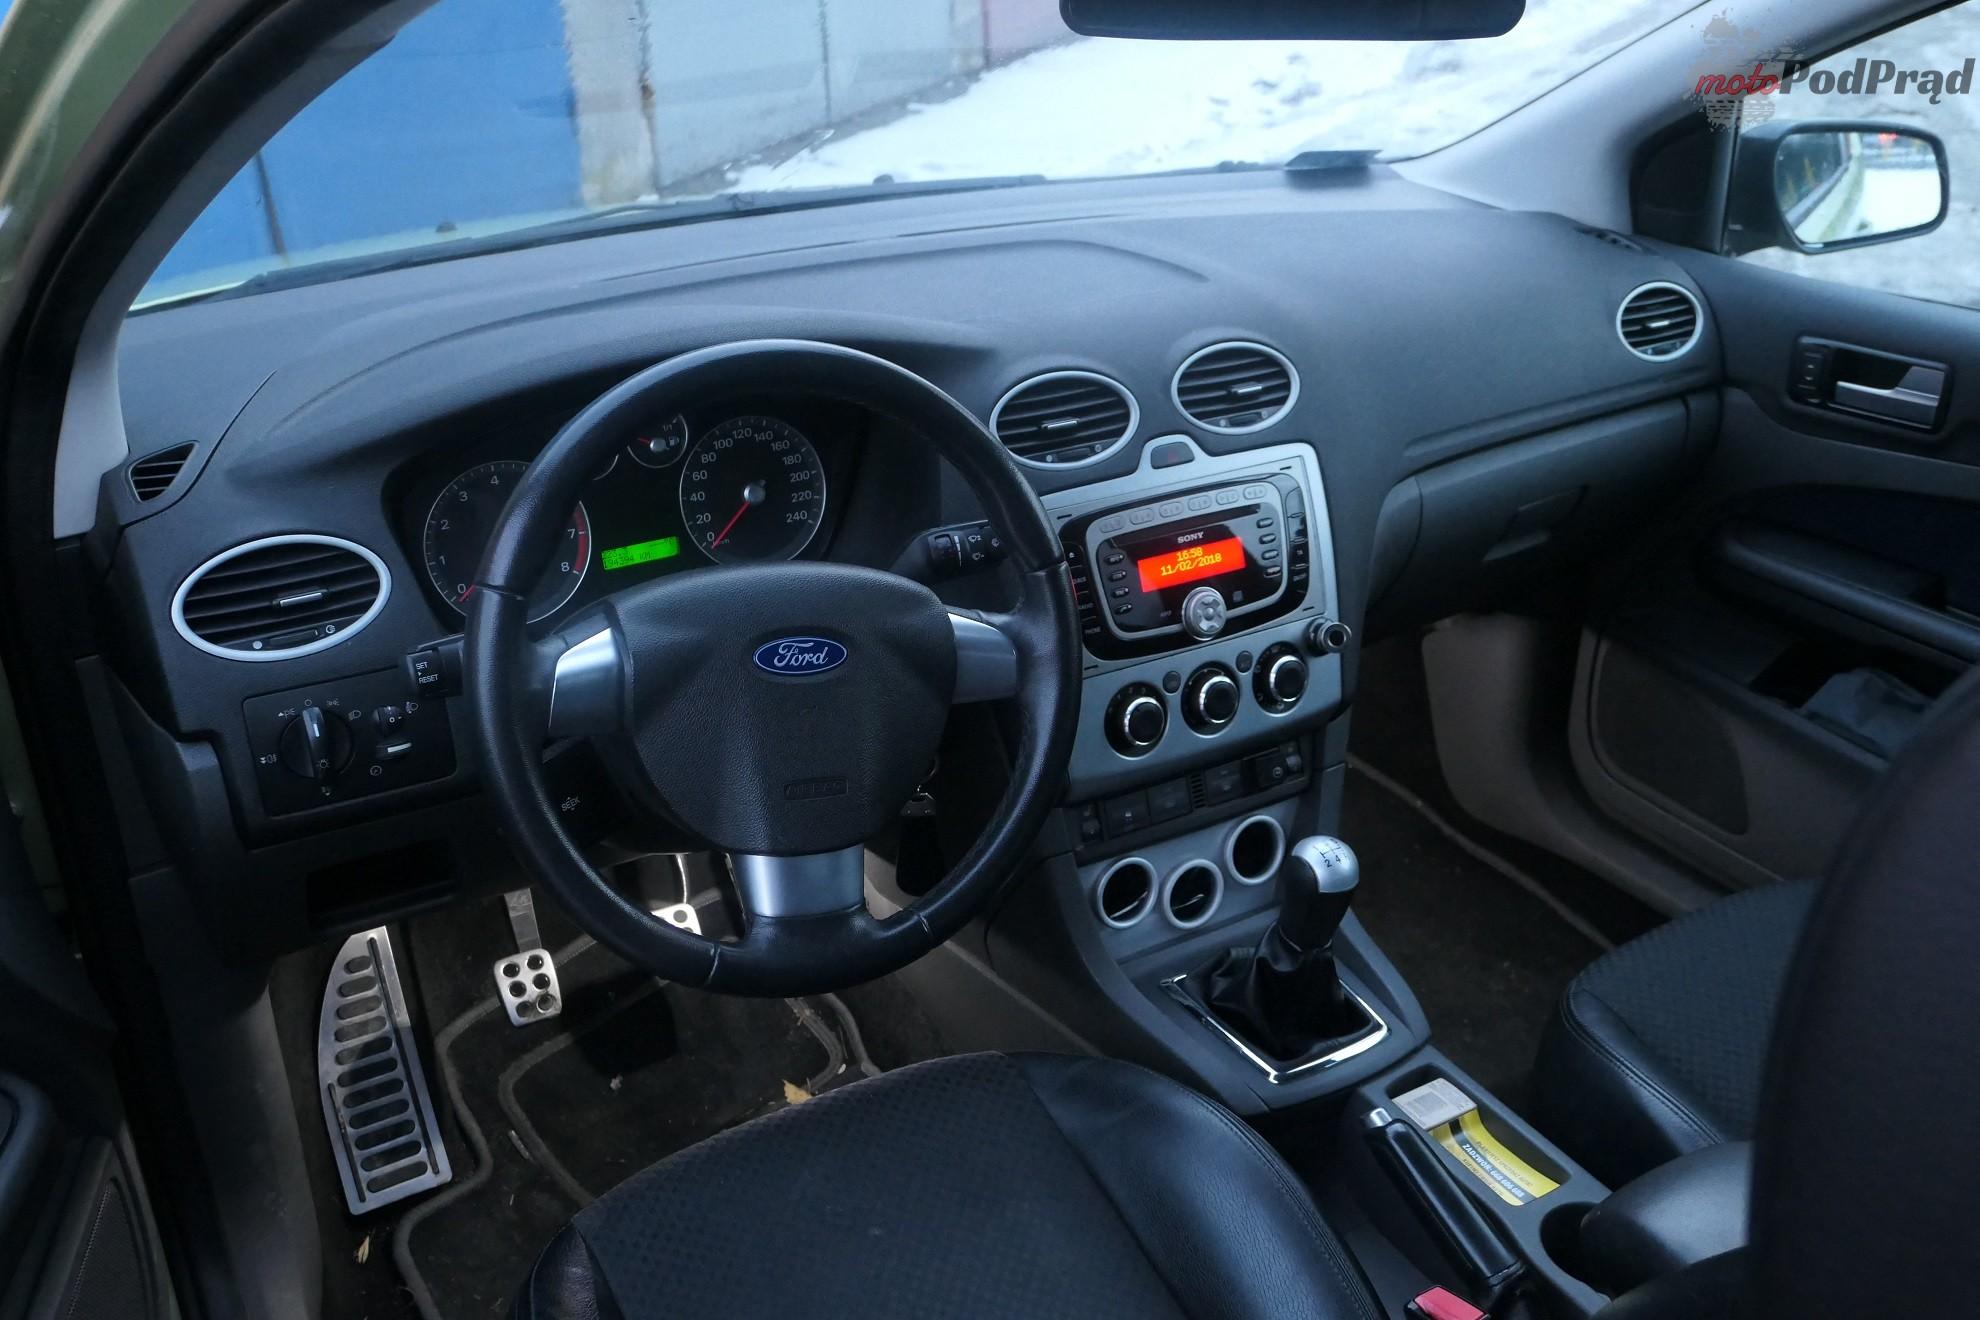 Ford Focus 18 Test: Ford Focus Mk2 2.0 145 KM   jak limonka